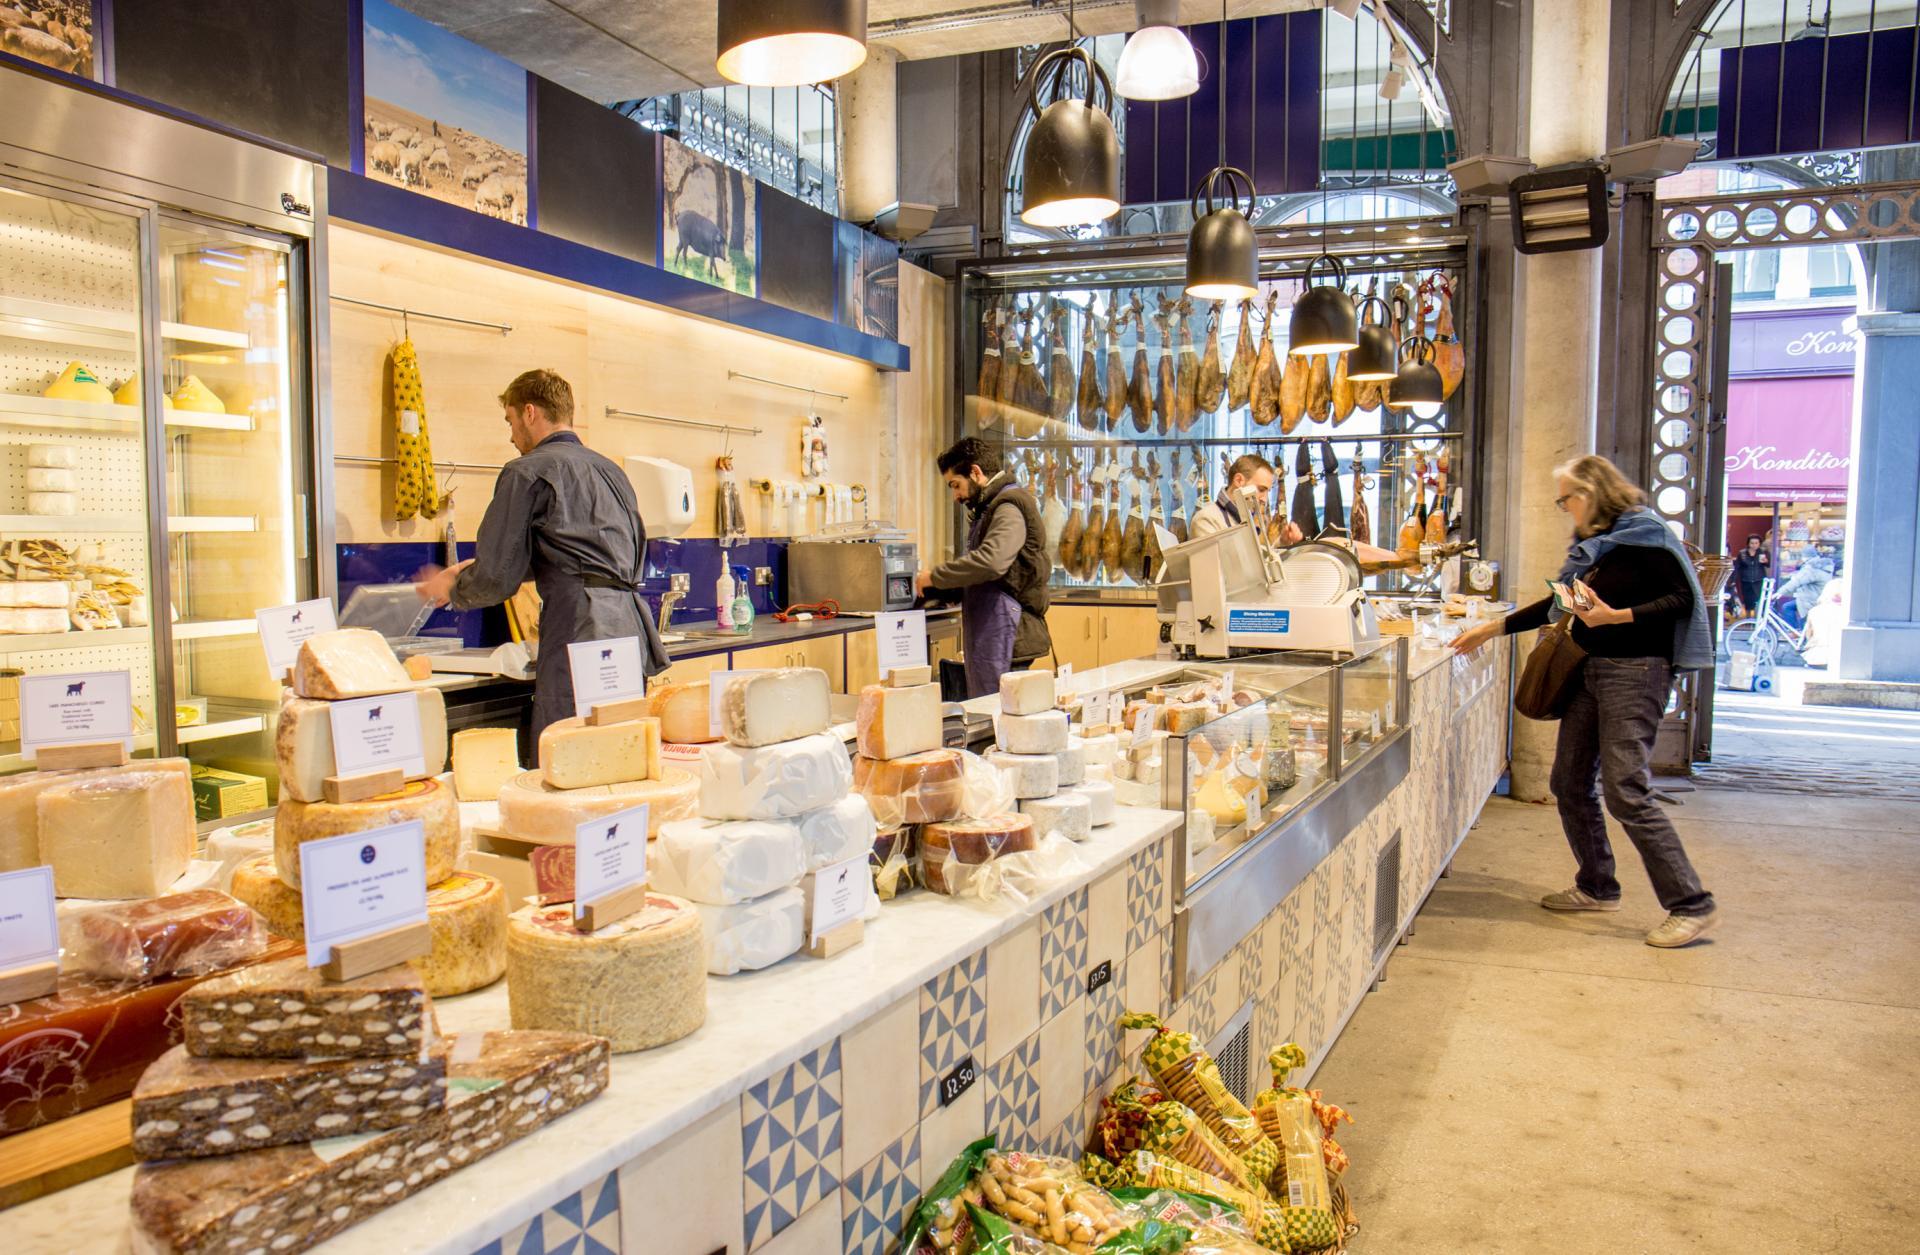 Best tapas London: Brindisa's deli counter in Borough Market